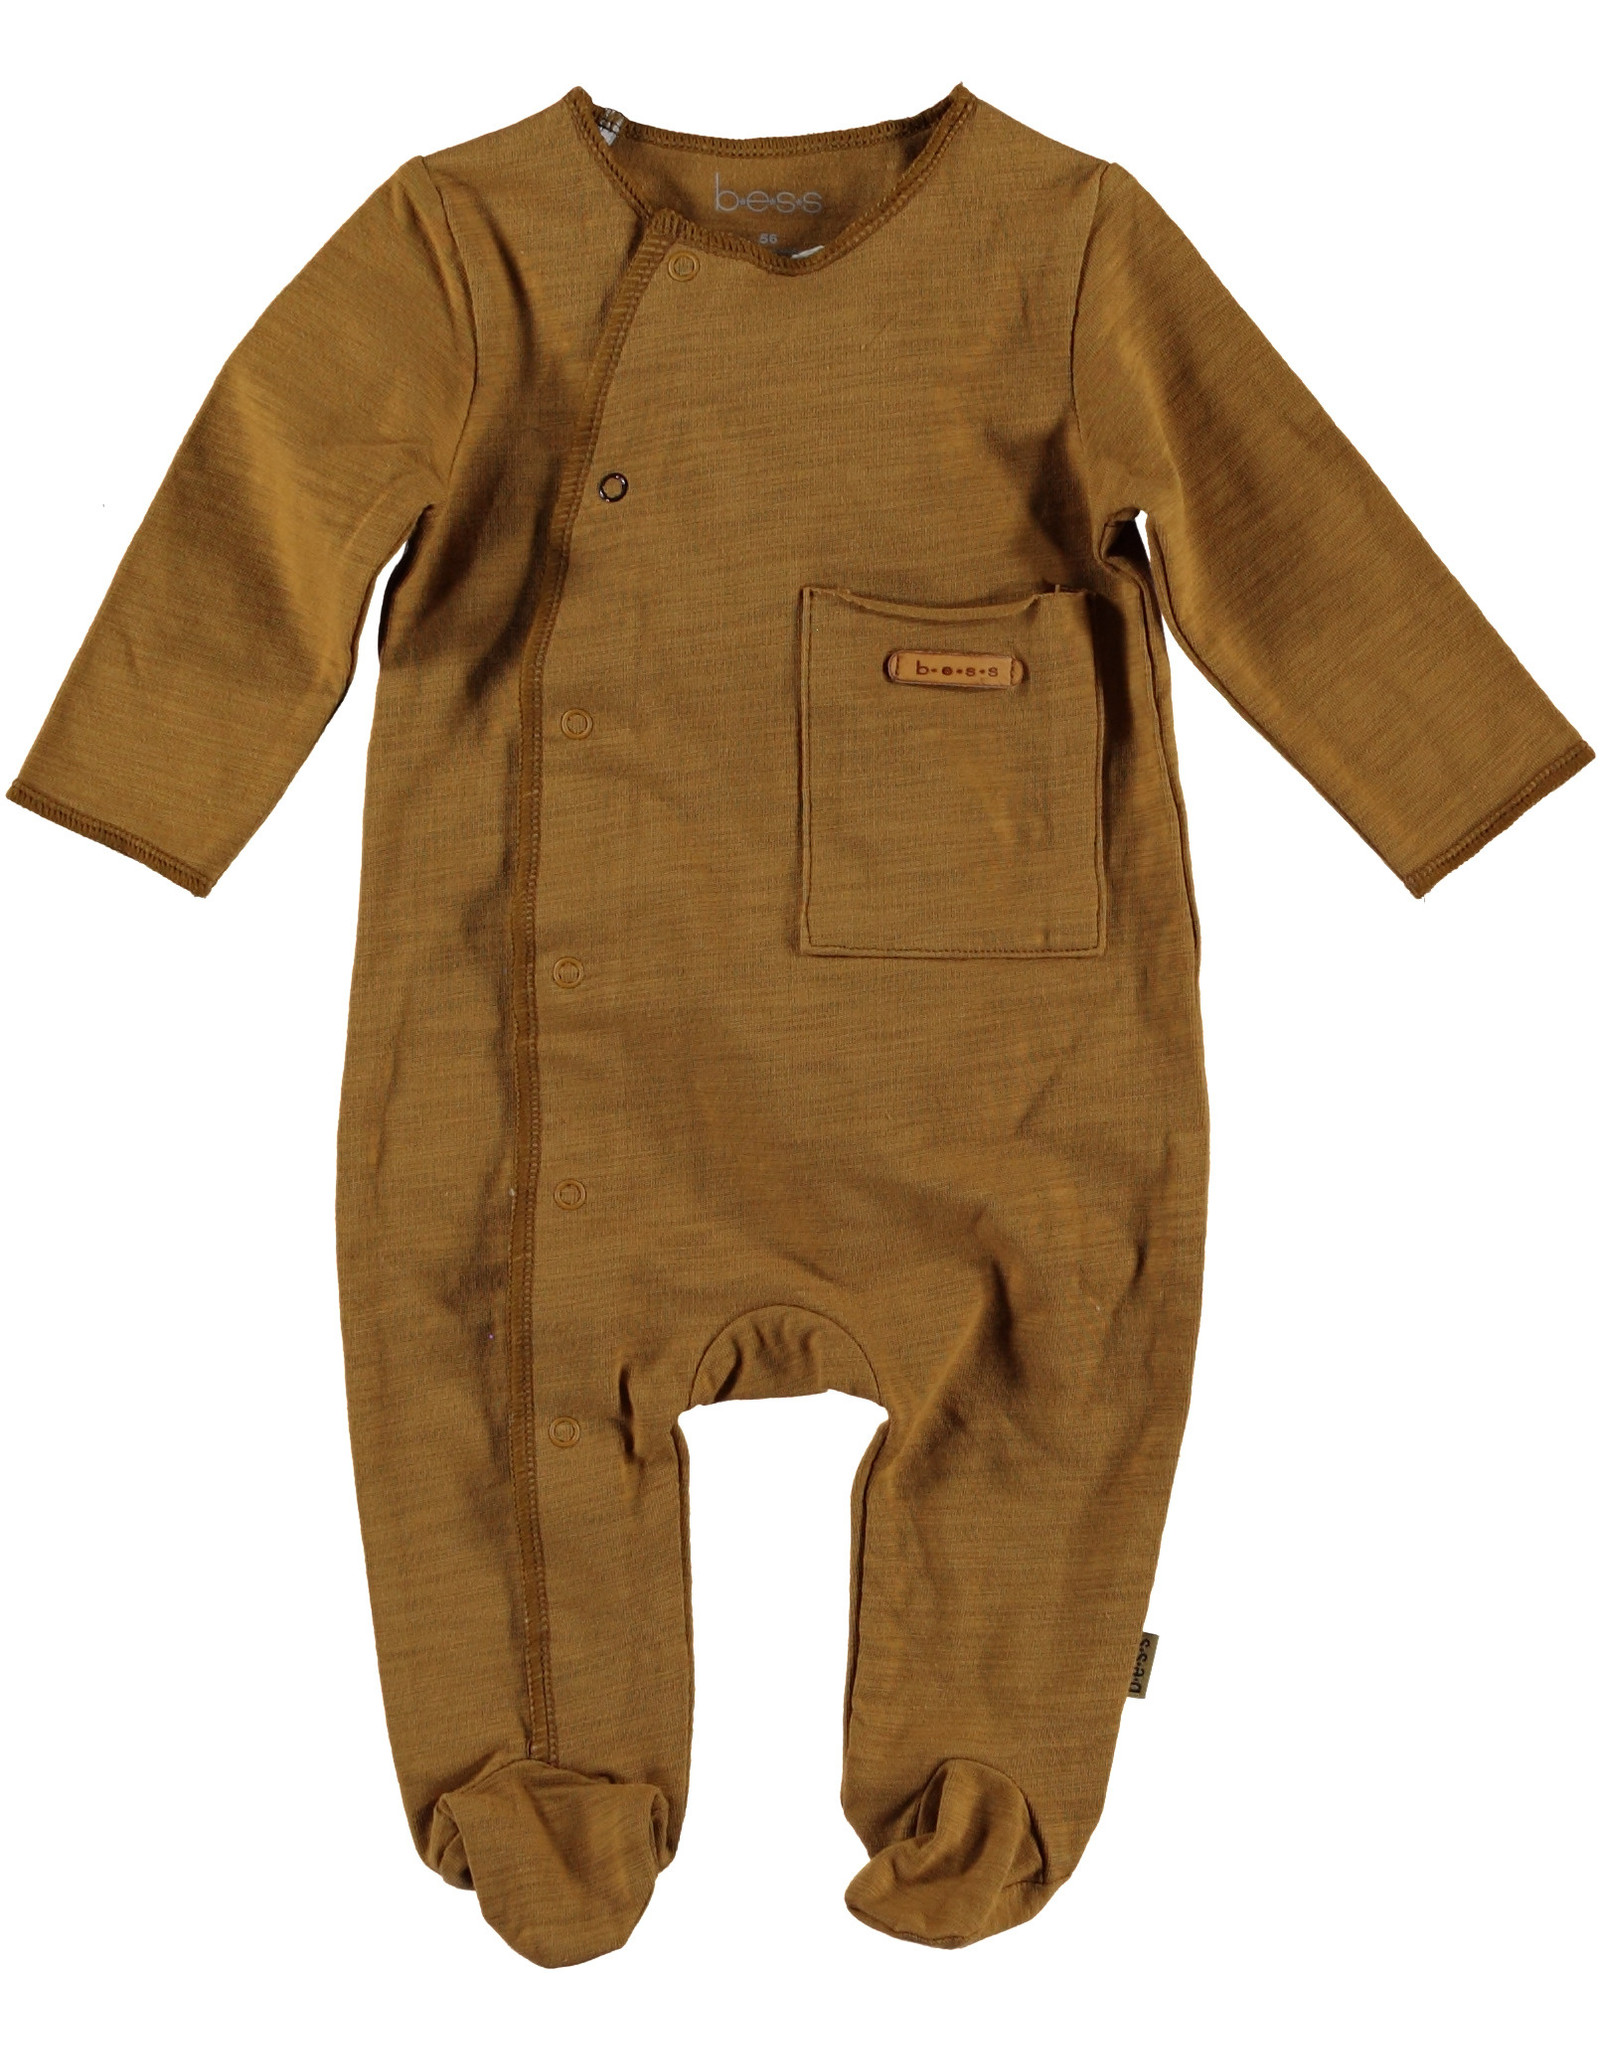 BESS Bess Suit Longsleeve Pocket Brown